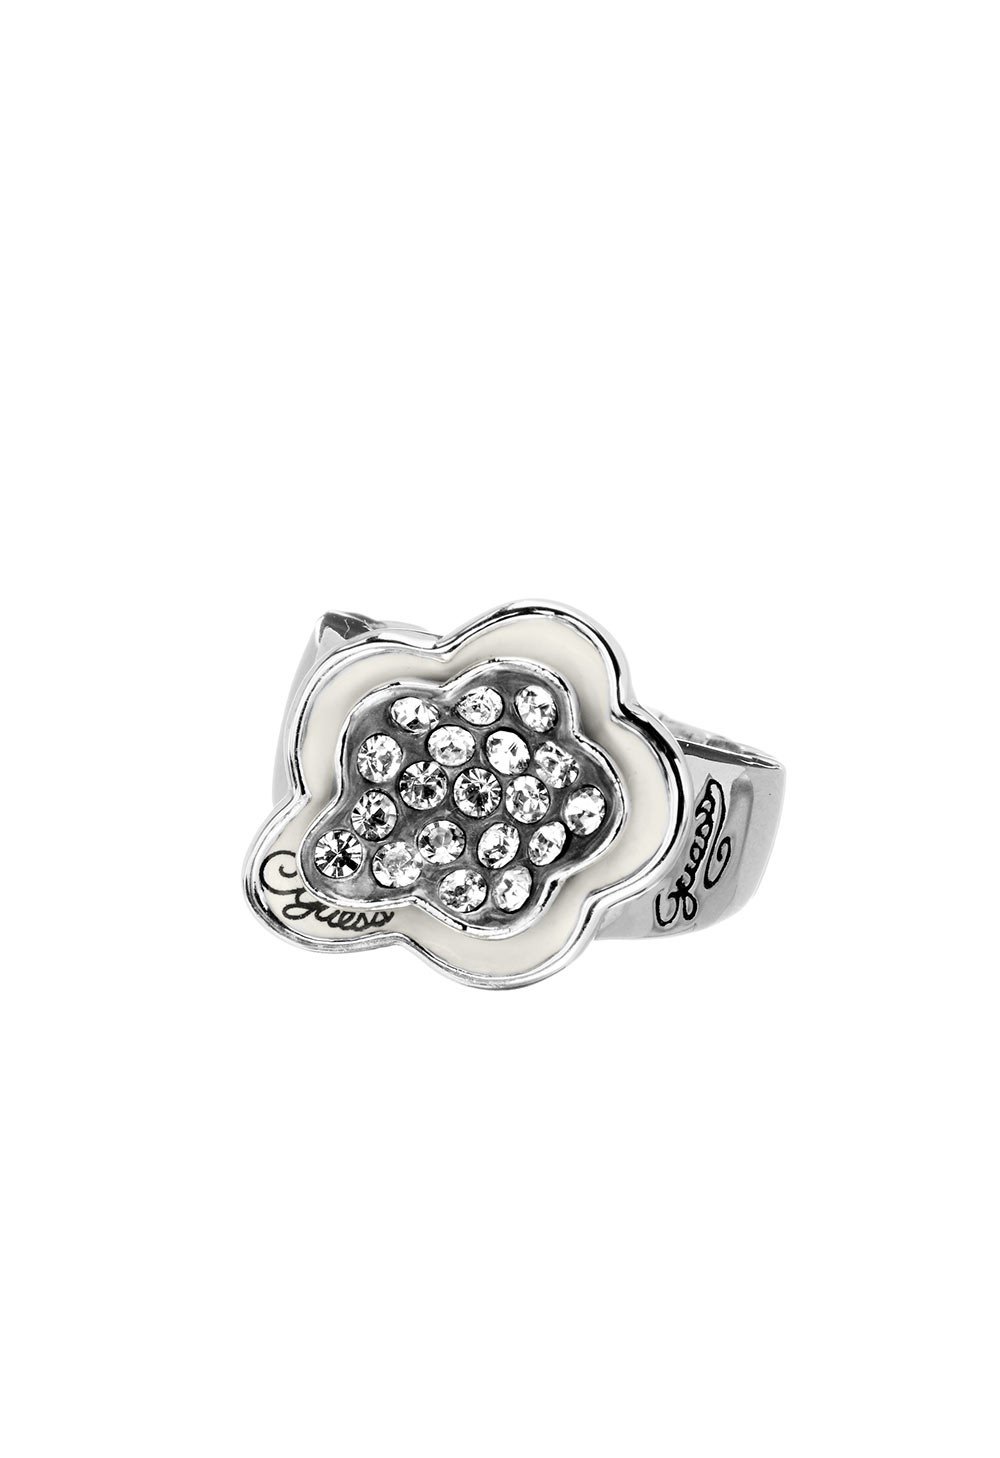 GUESS FAUX UBR31113-S Ασημένιο Δαχτυλίδι Με Λουλούδι 5a20f492c4d